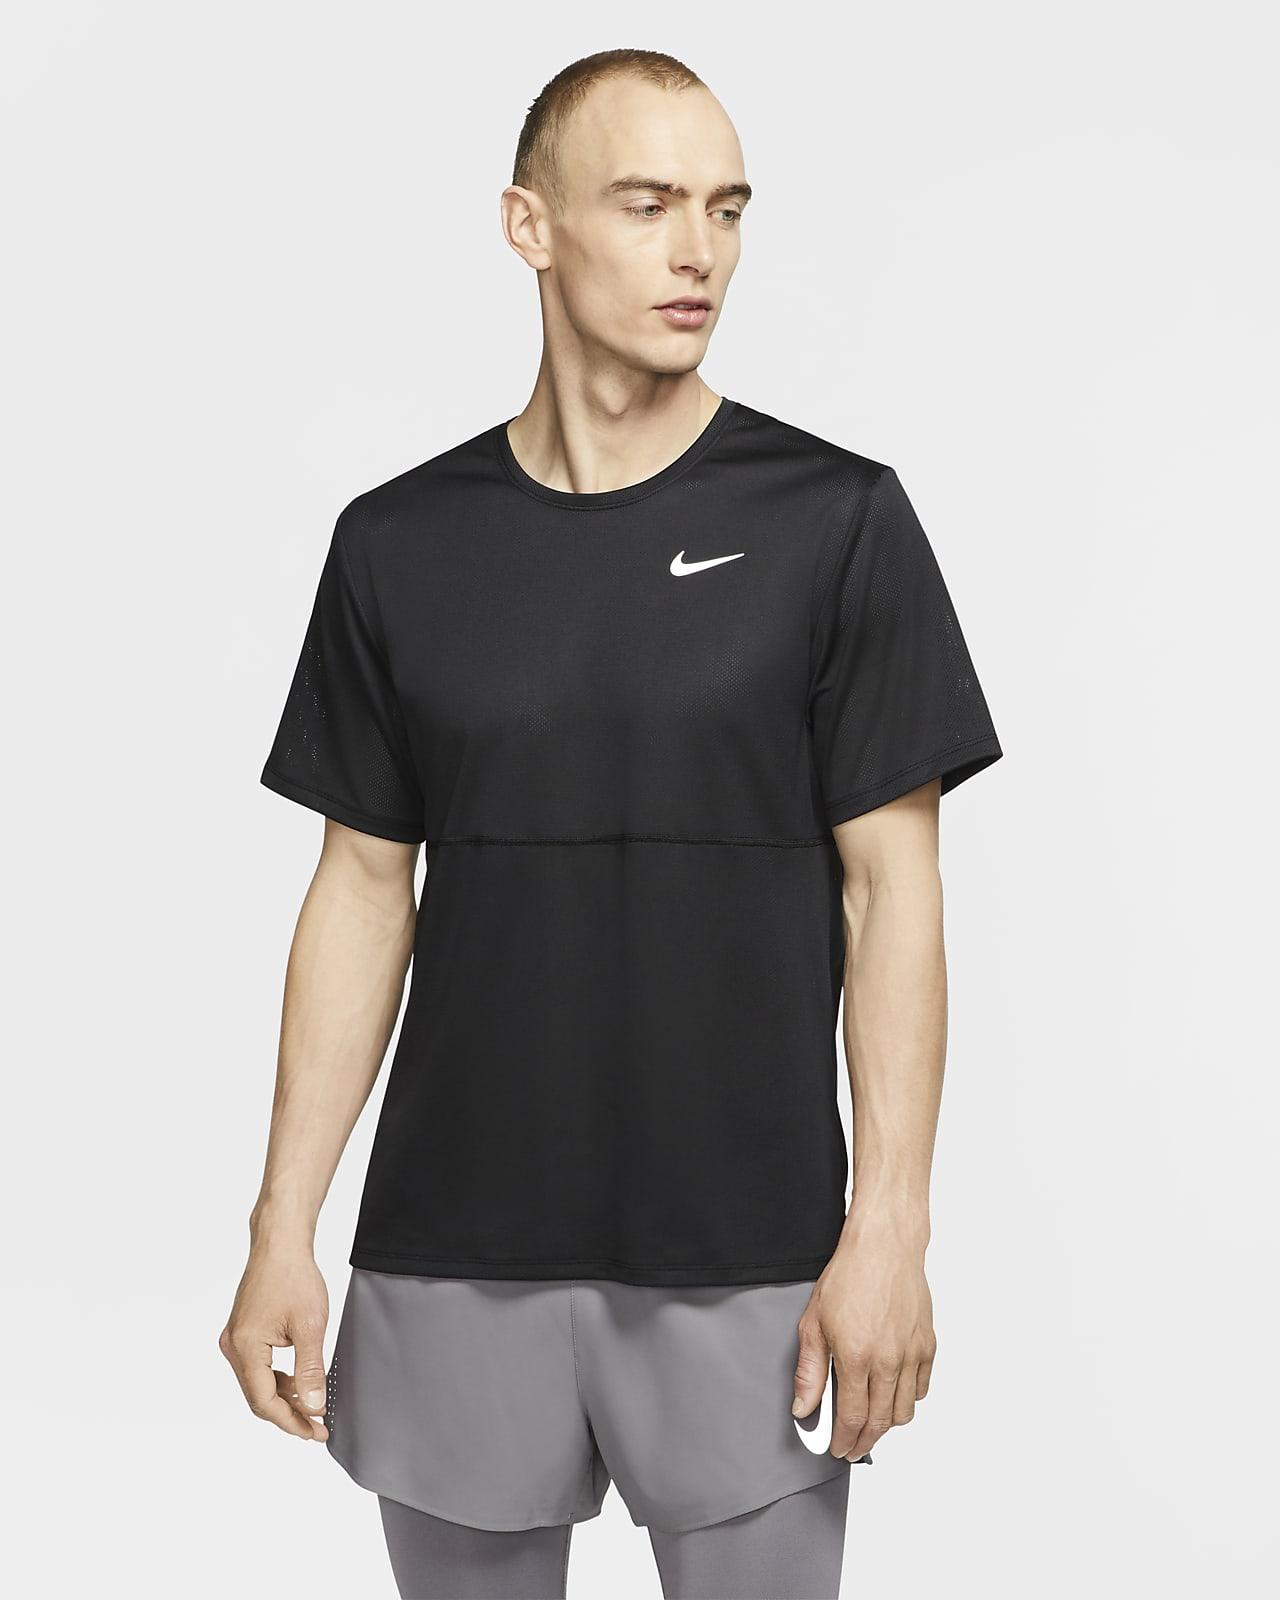 Nike Breathe Men's Running Top. Nike GB